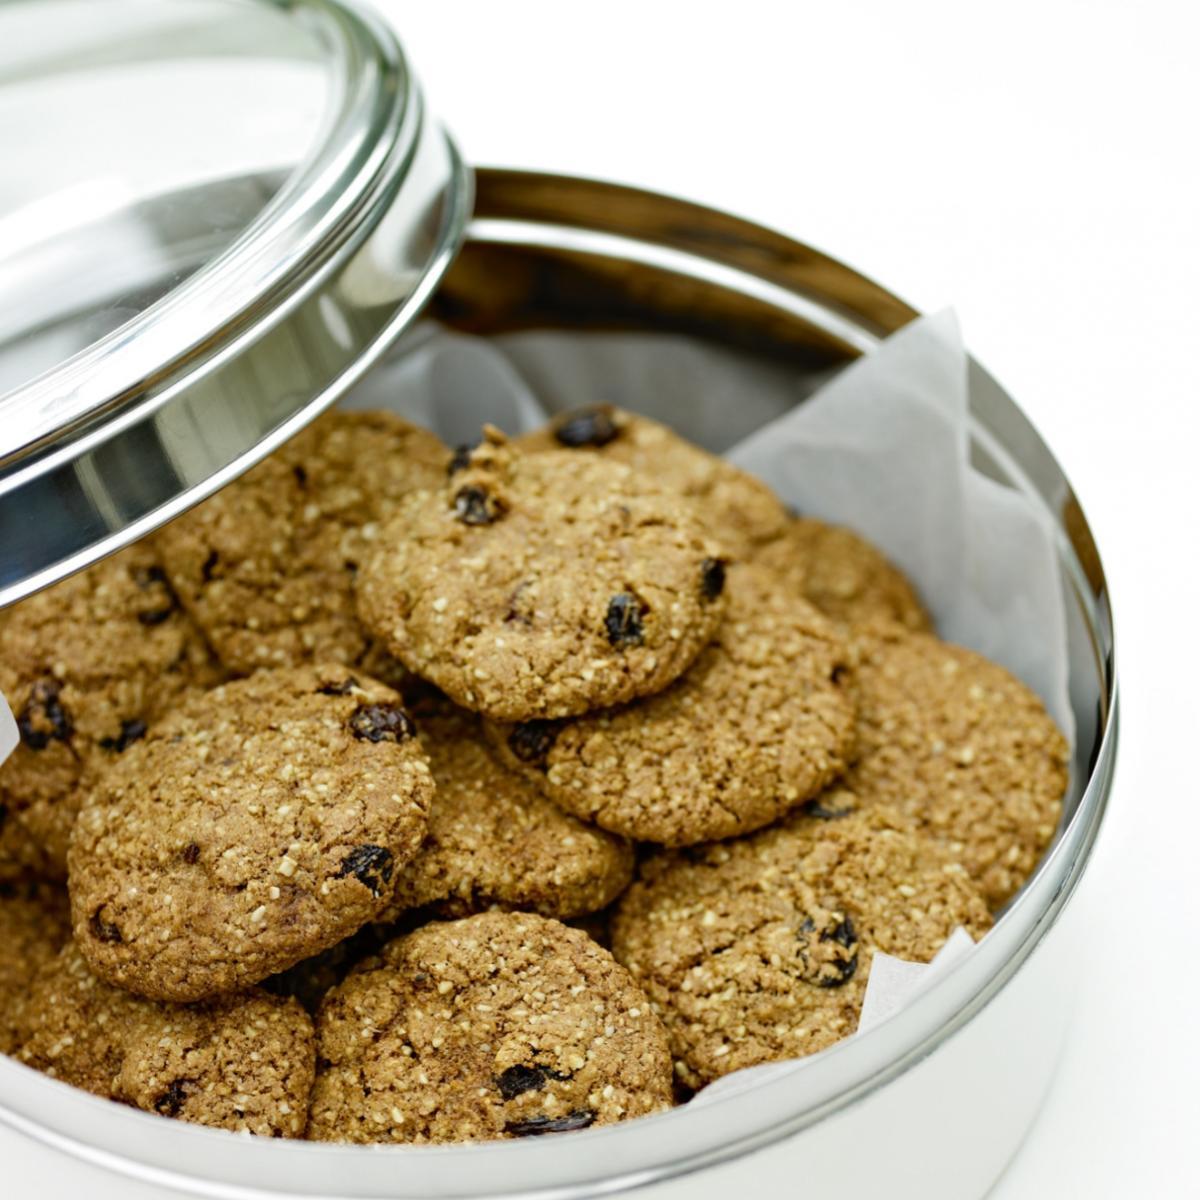 A picture of Delia's Oat and Raisin Cookies recipe